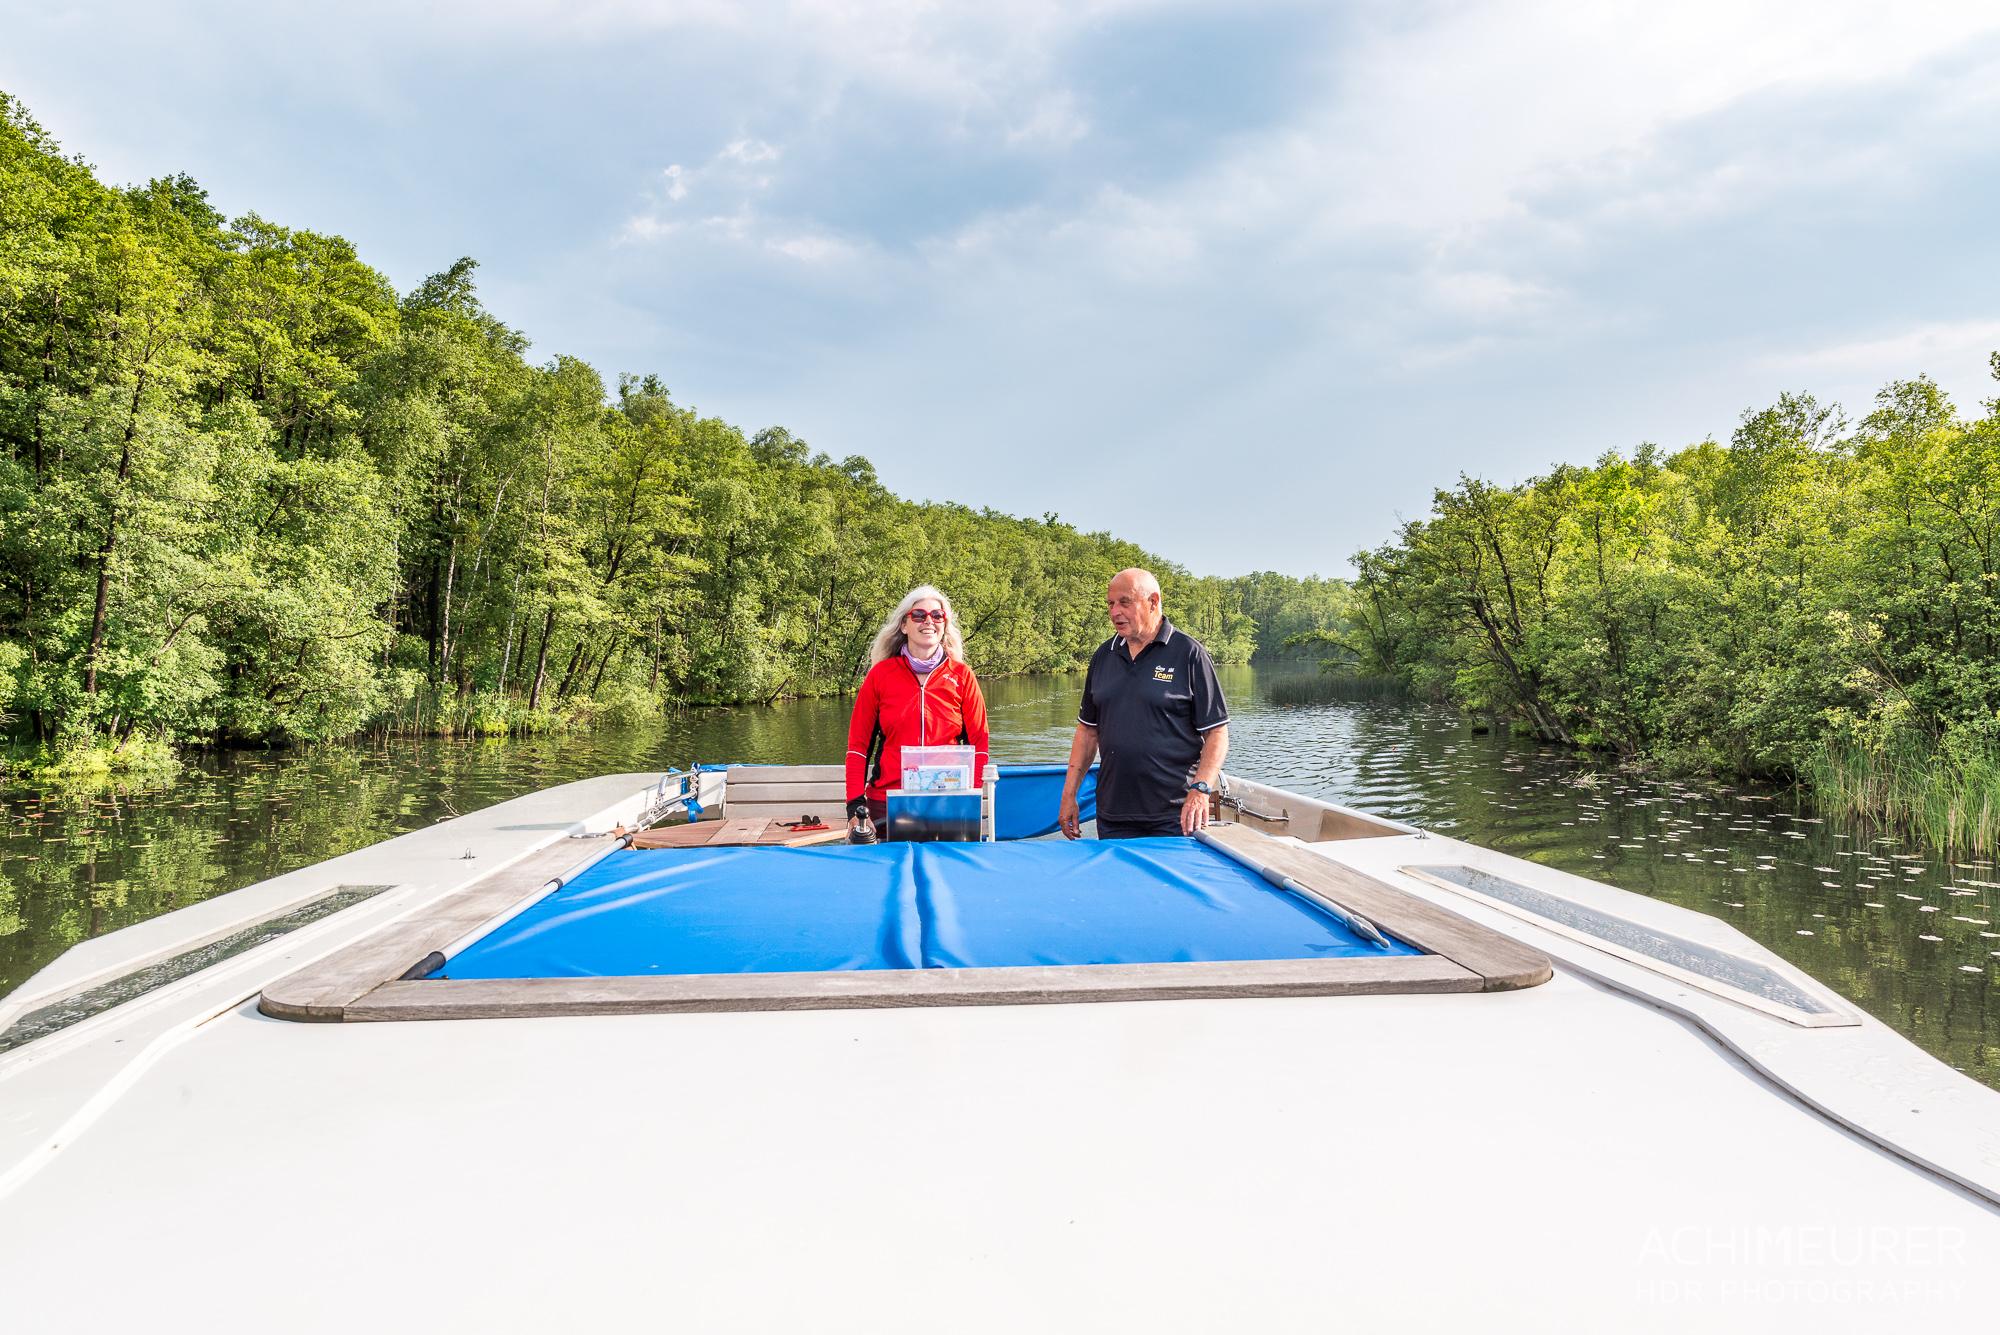 Hausboot-Kuhnle-Mueritz-Mecklenburg-Vorpommern-See_2657